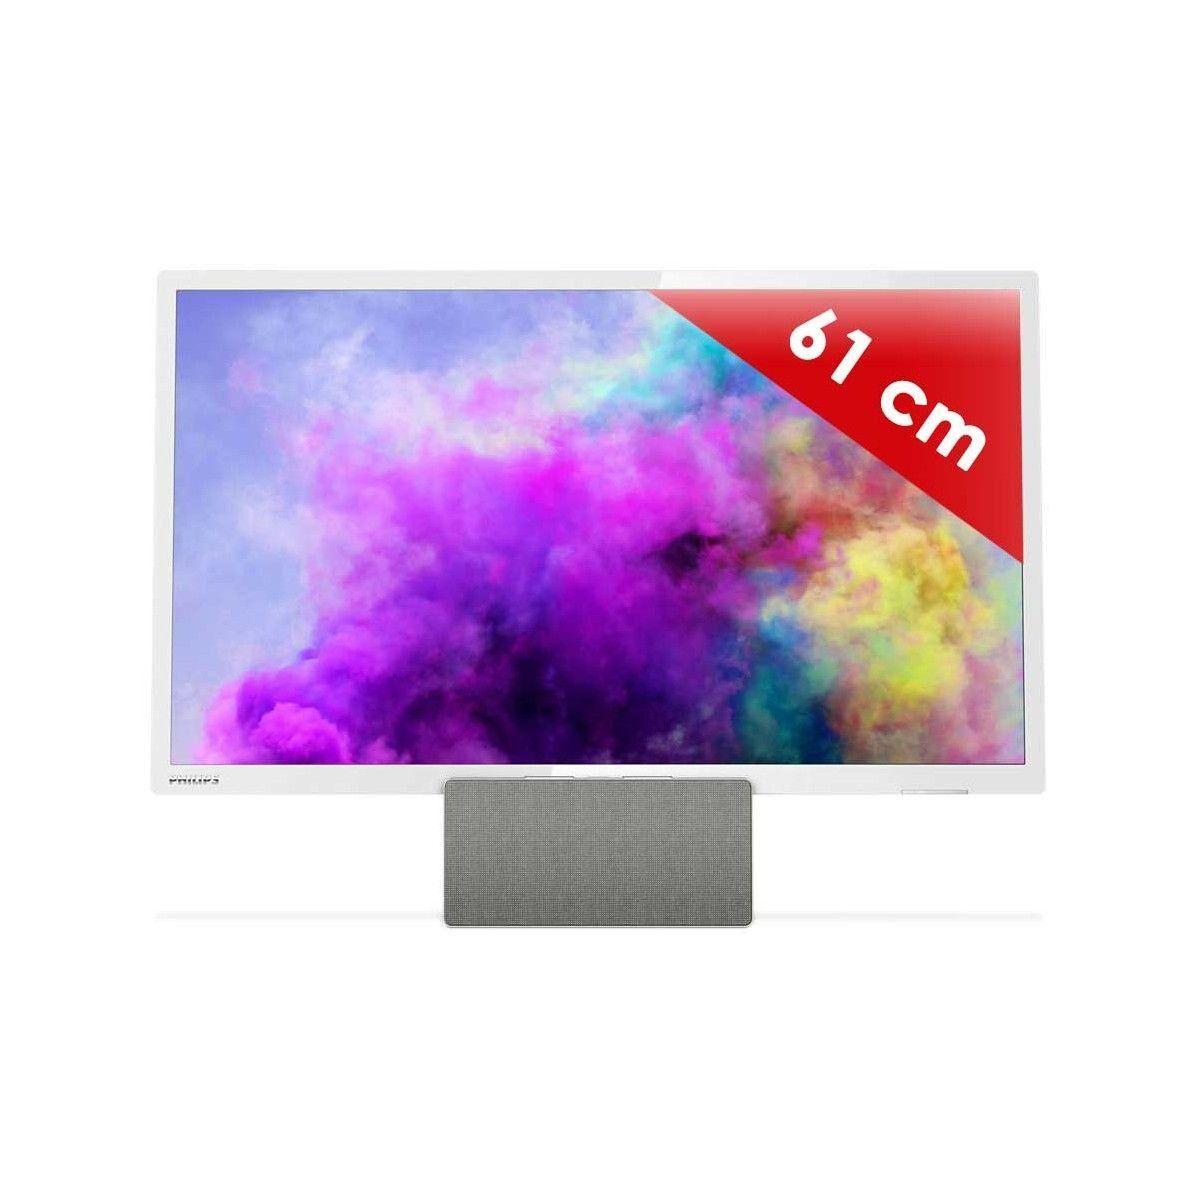 PHILIPS TV Led Full HD 24 PFS 5703/12 - 24'